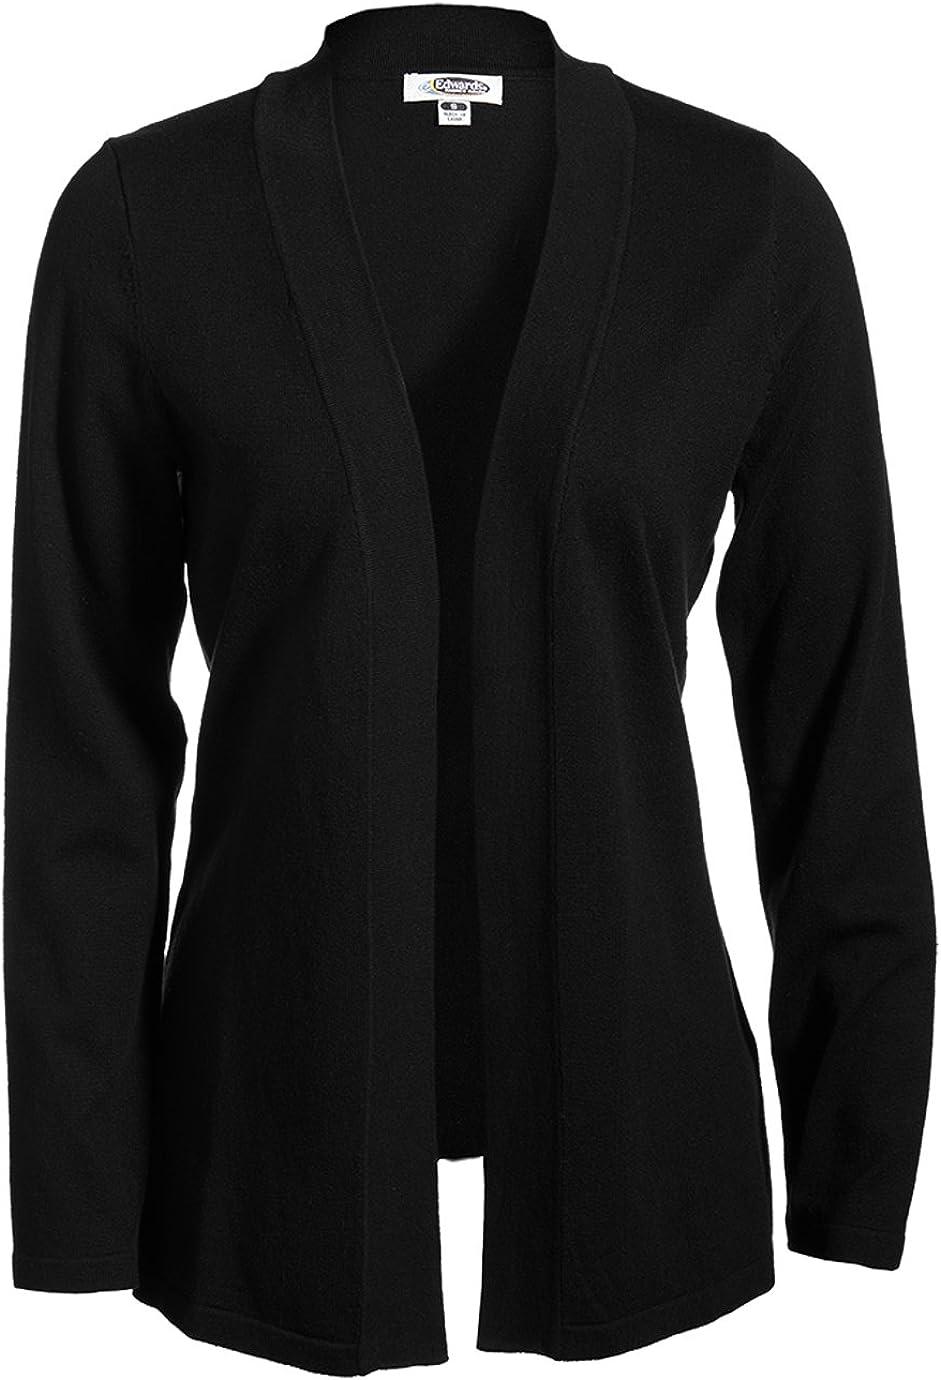 Edwards Garment Black Women's Open Front Cardigan, Size: XL